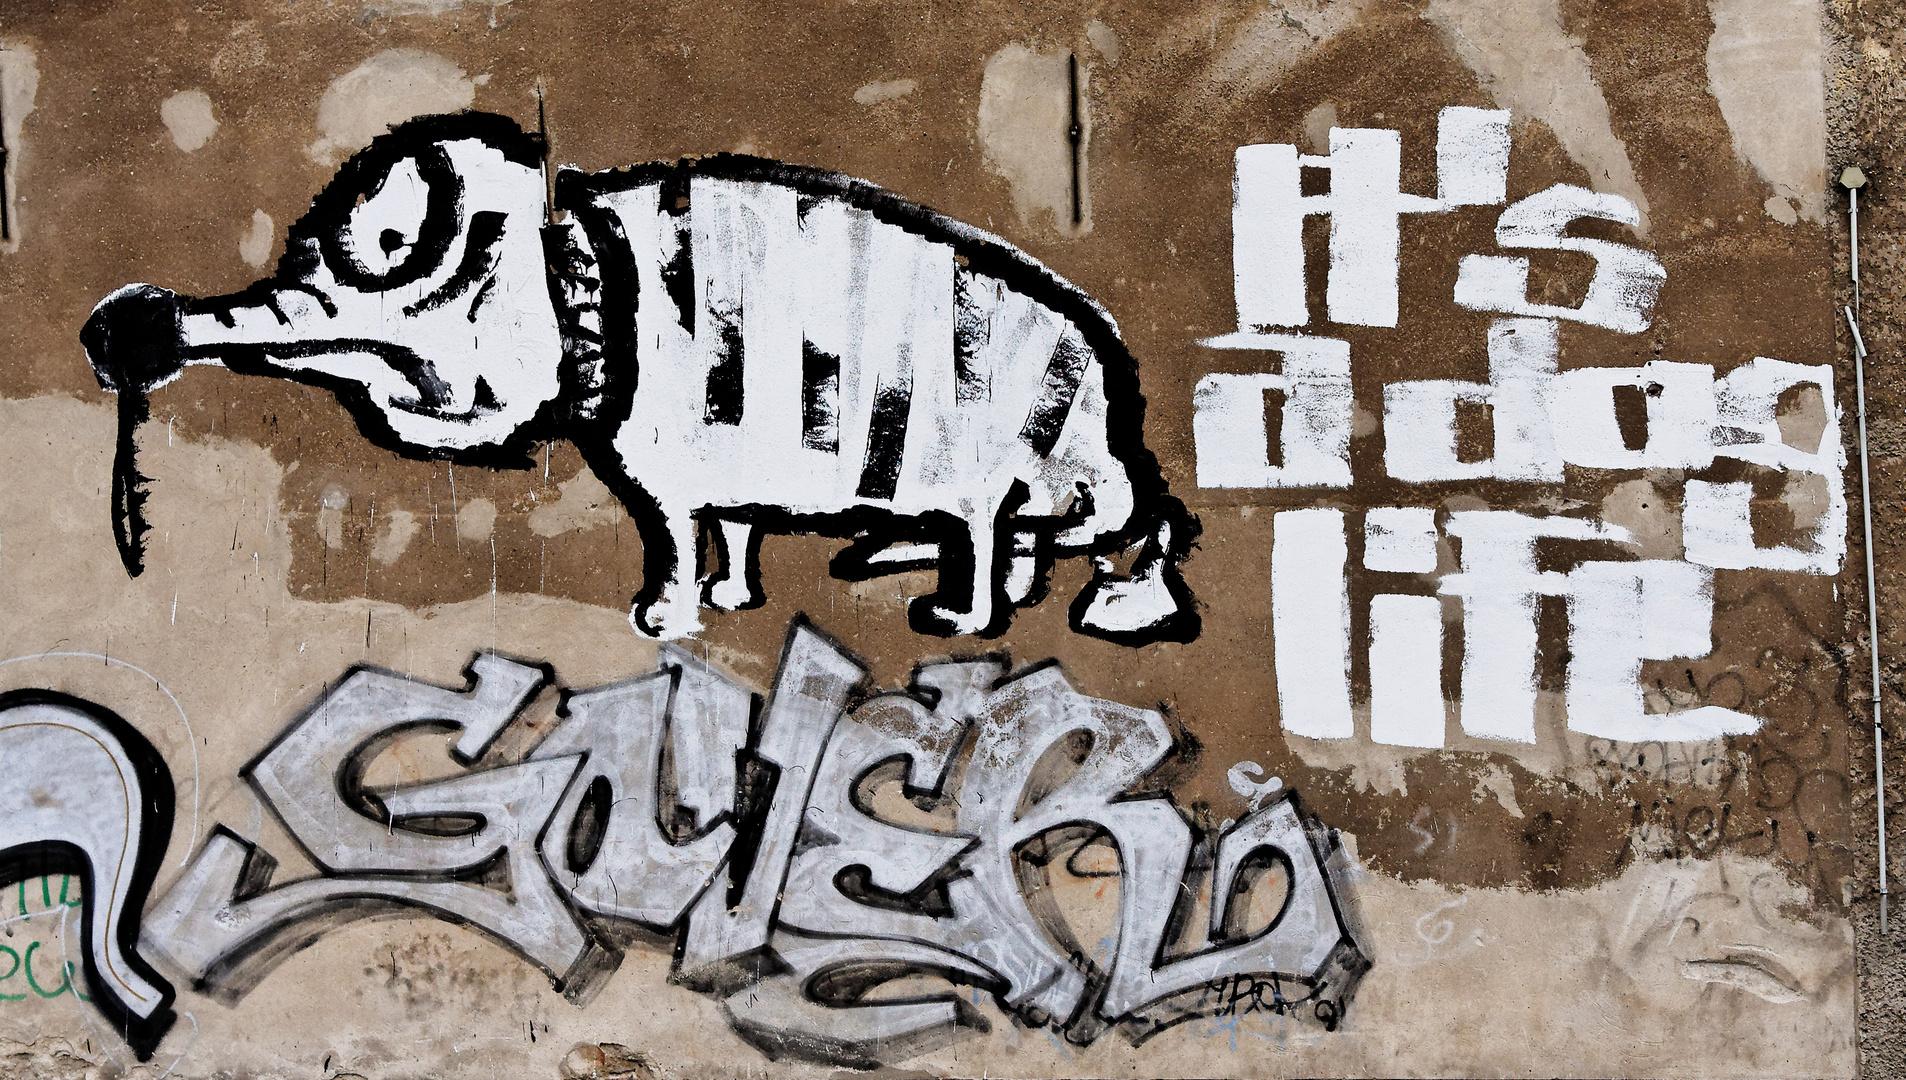 Urbanes - it's a dog life